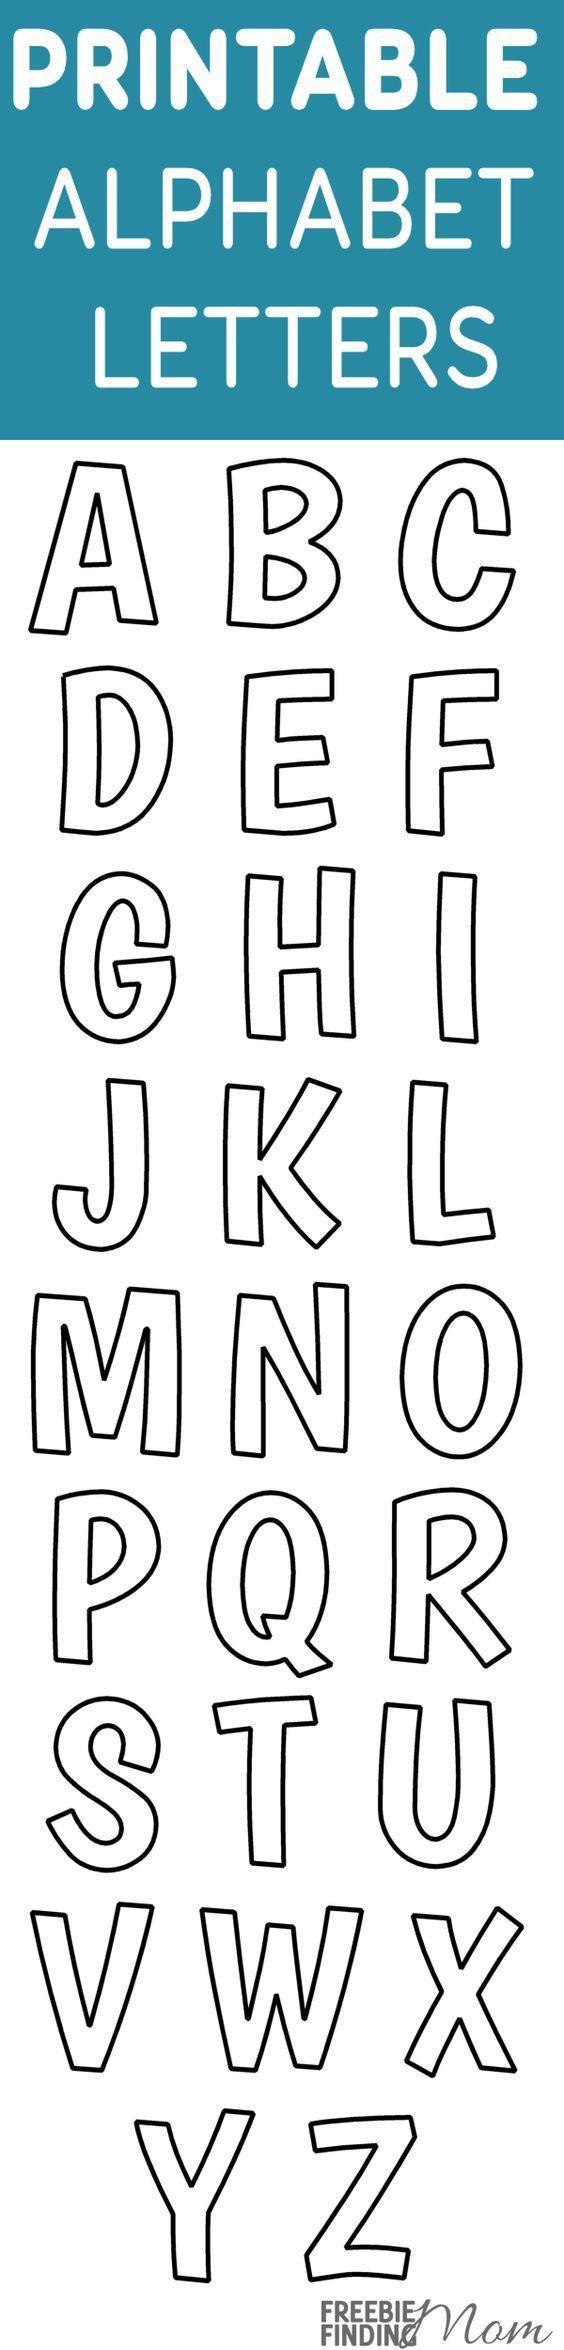 Printable FREE Alphabet Templates Alphabet templates